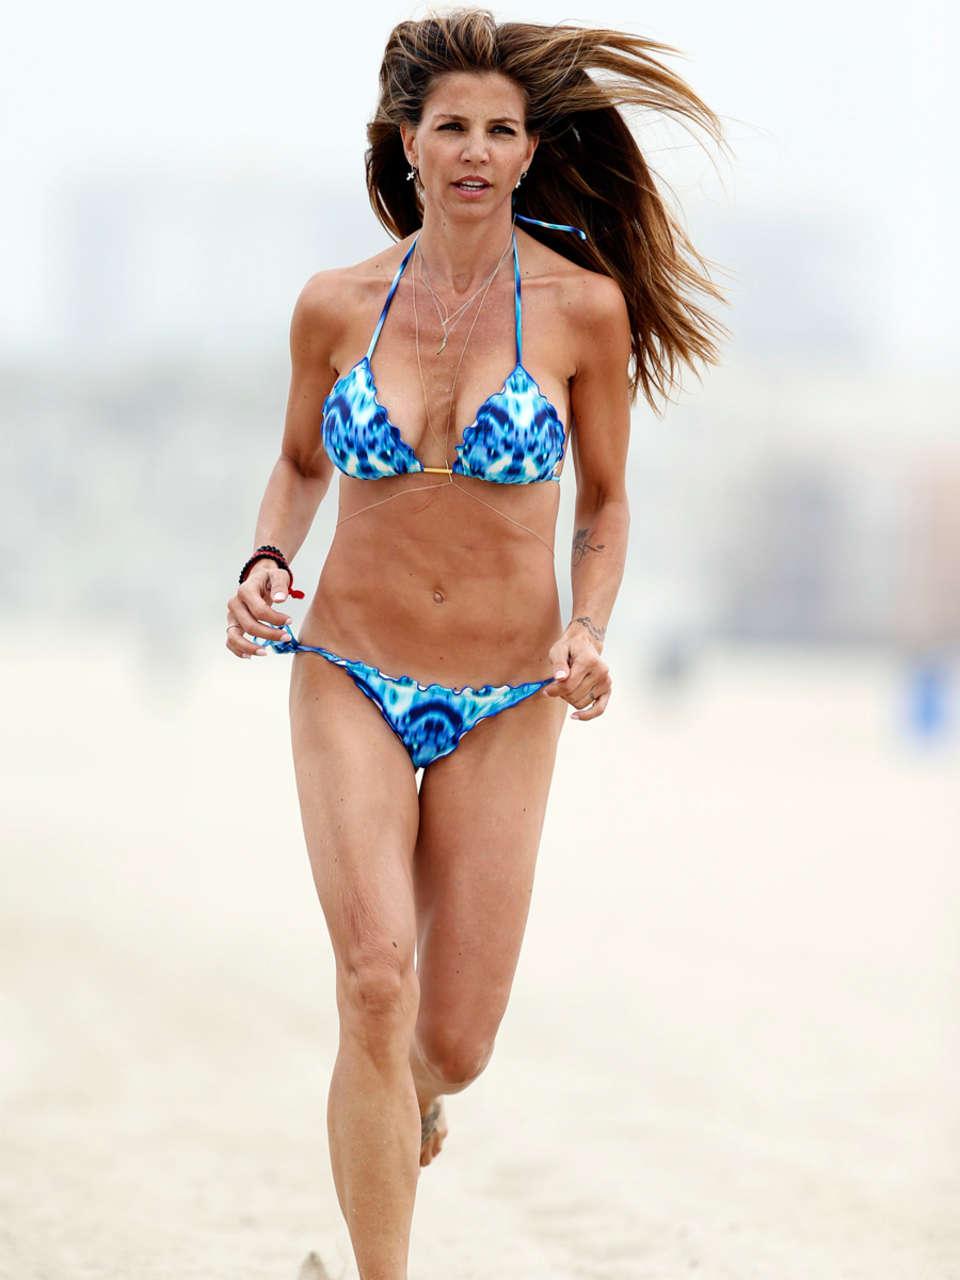 Charisma Carpenter Bikini Photos: